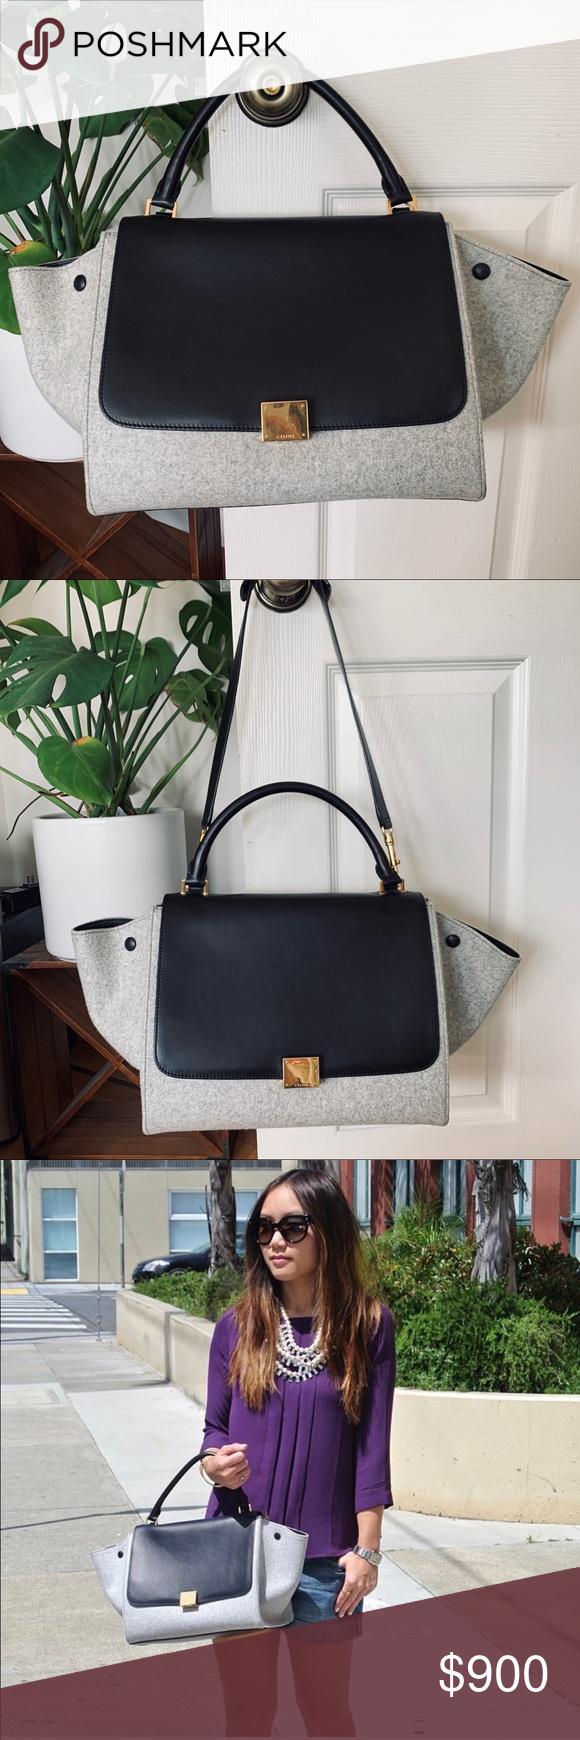 Celine Medium Trapeze Bag black and light gray This